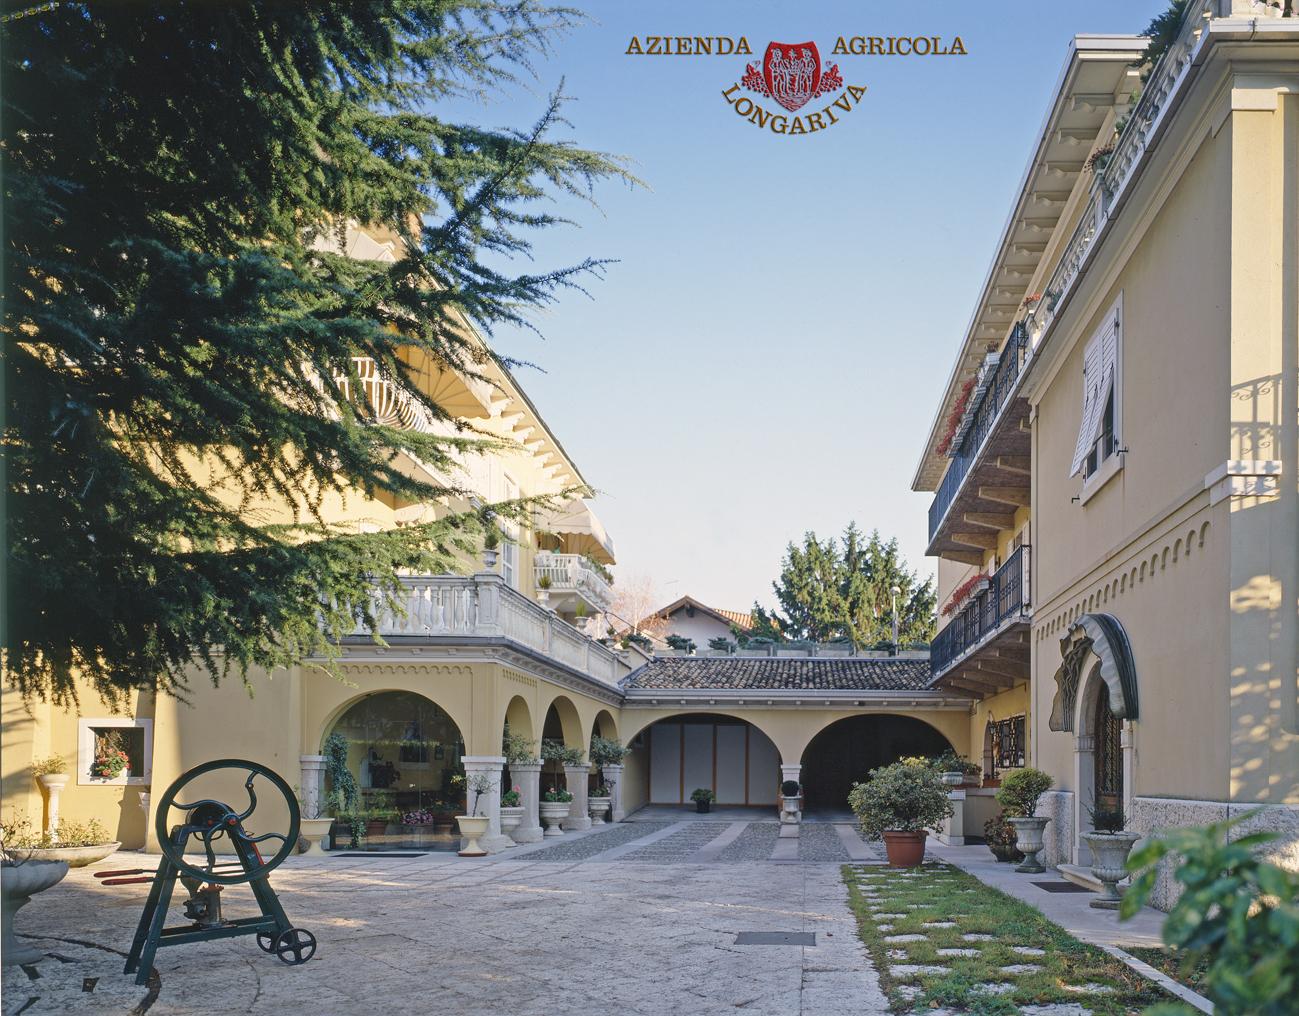 La cantina Longariva a Rovereto